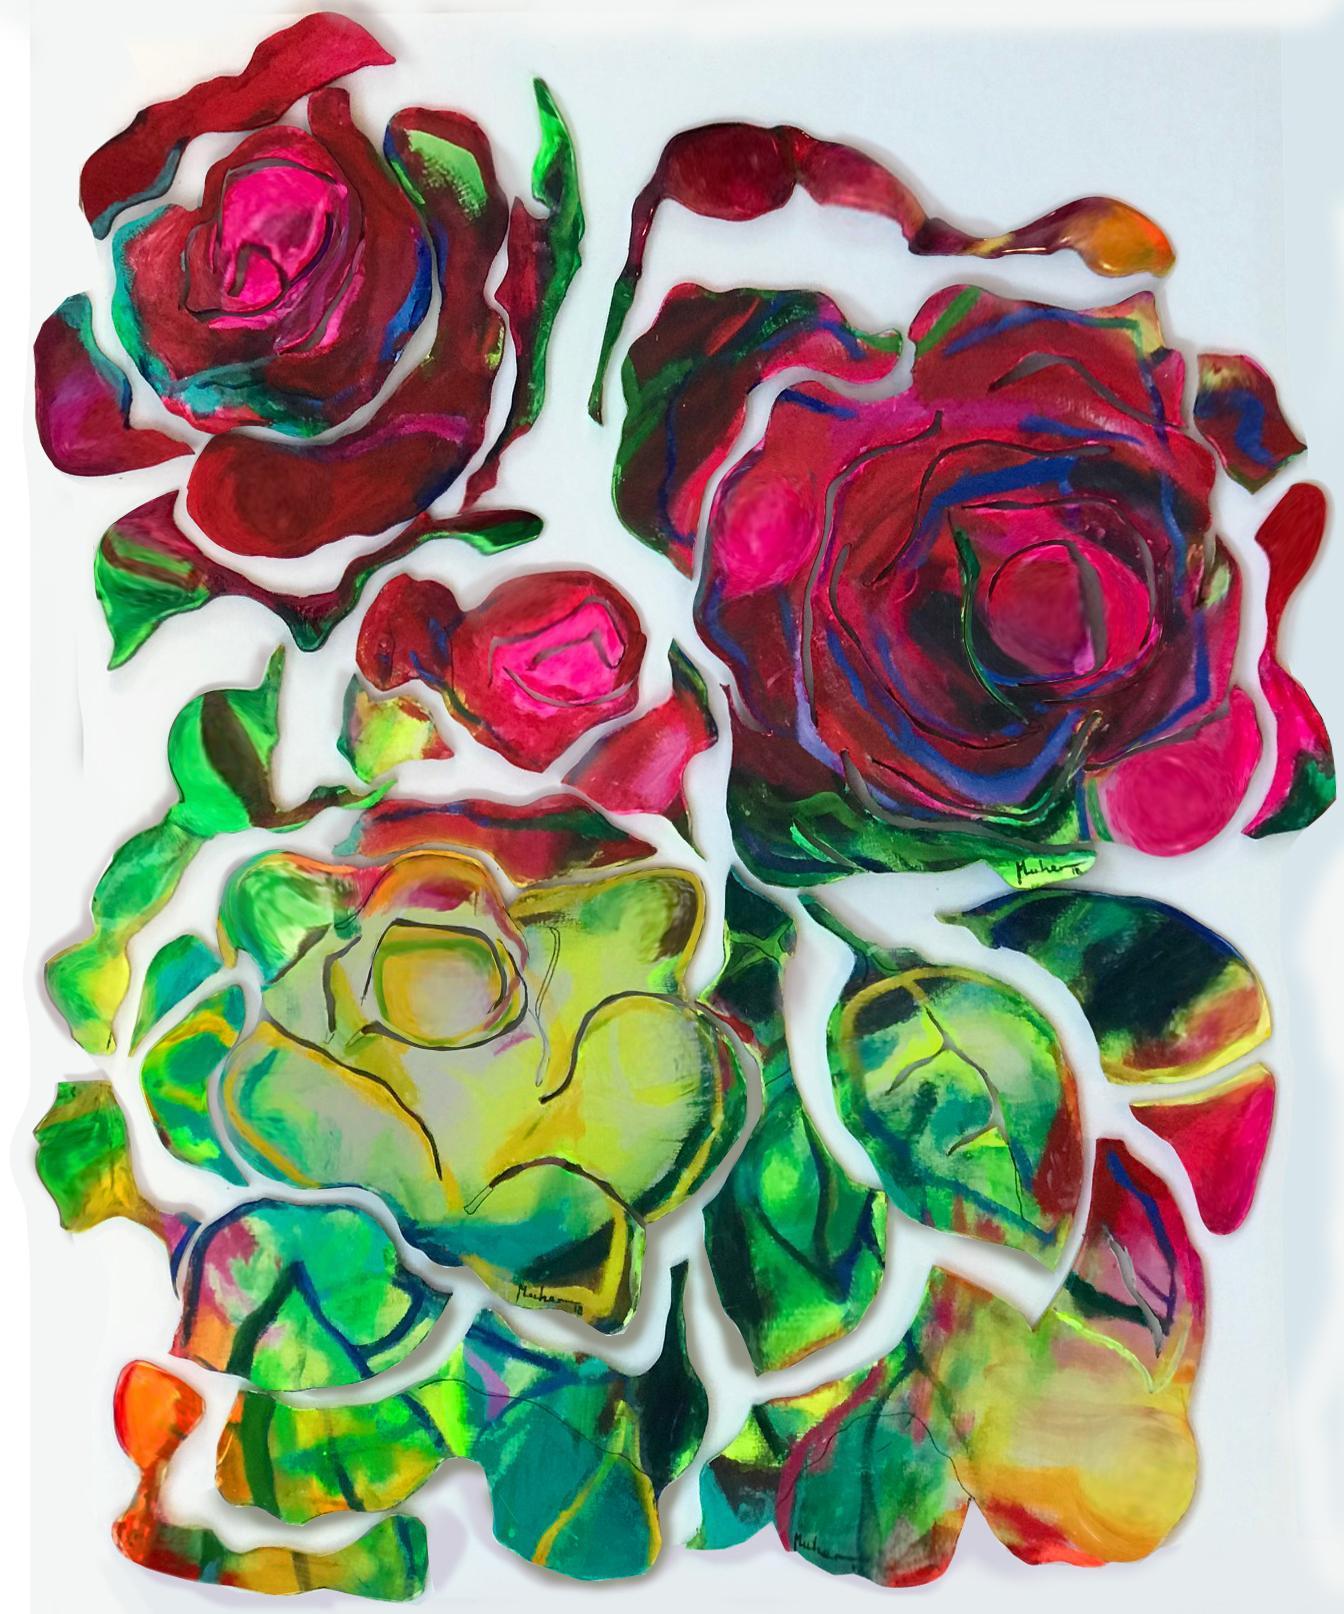 22grupo de rosas deconstruidas . obra tecnica mixta . acrliico y resina sobre madera